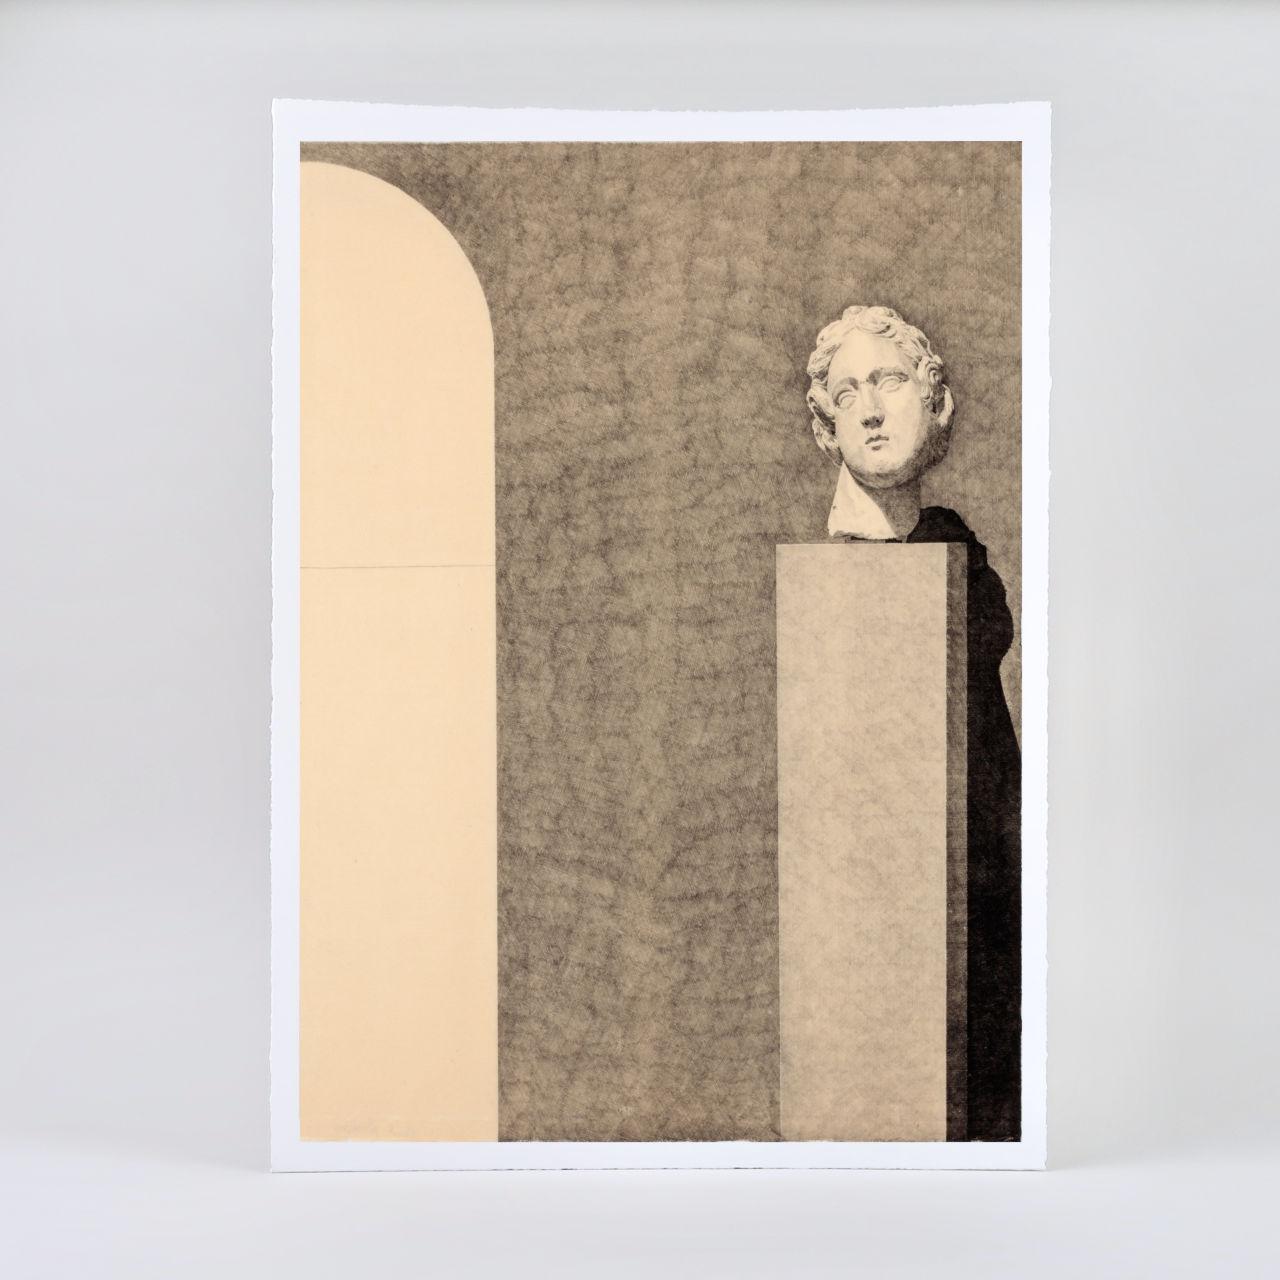 Limited Edition Giclée Print - Head